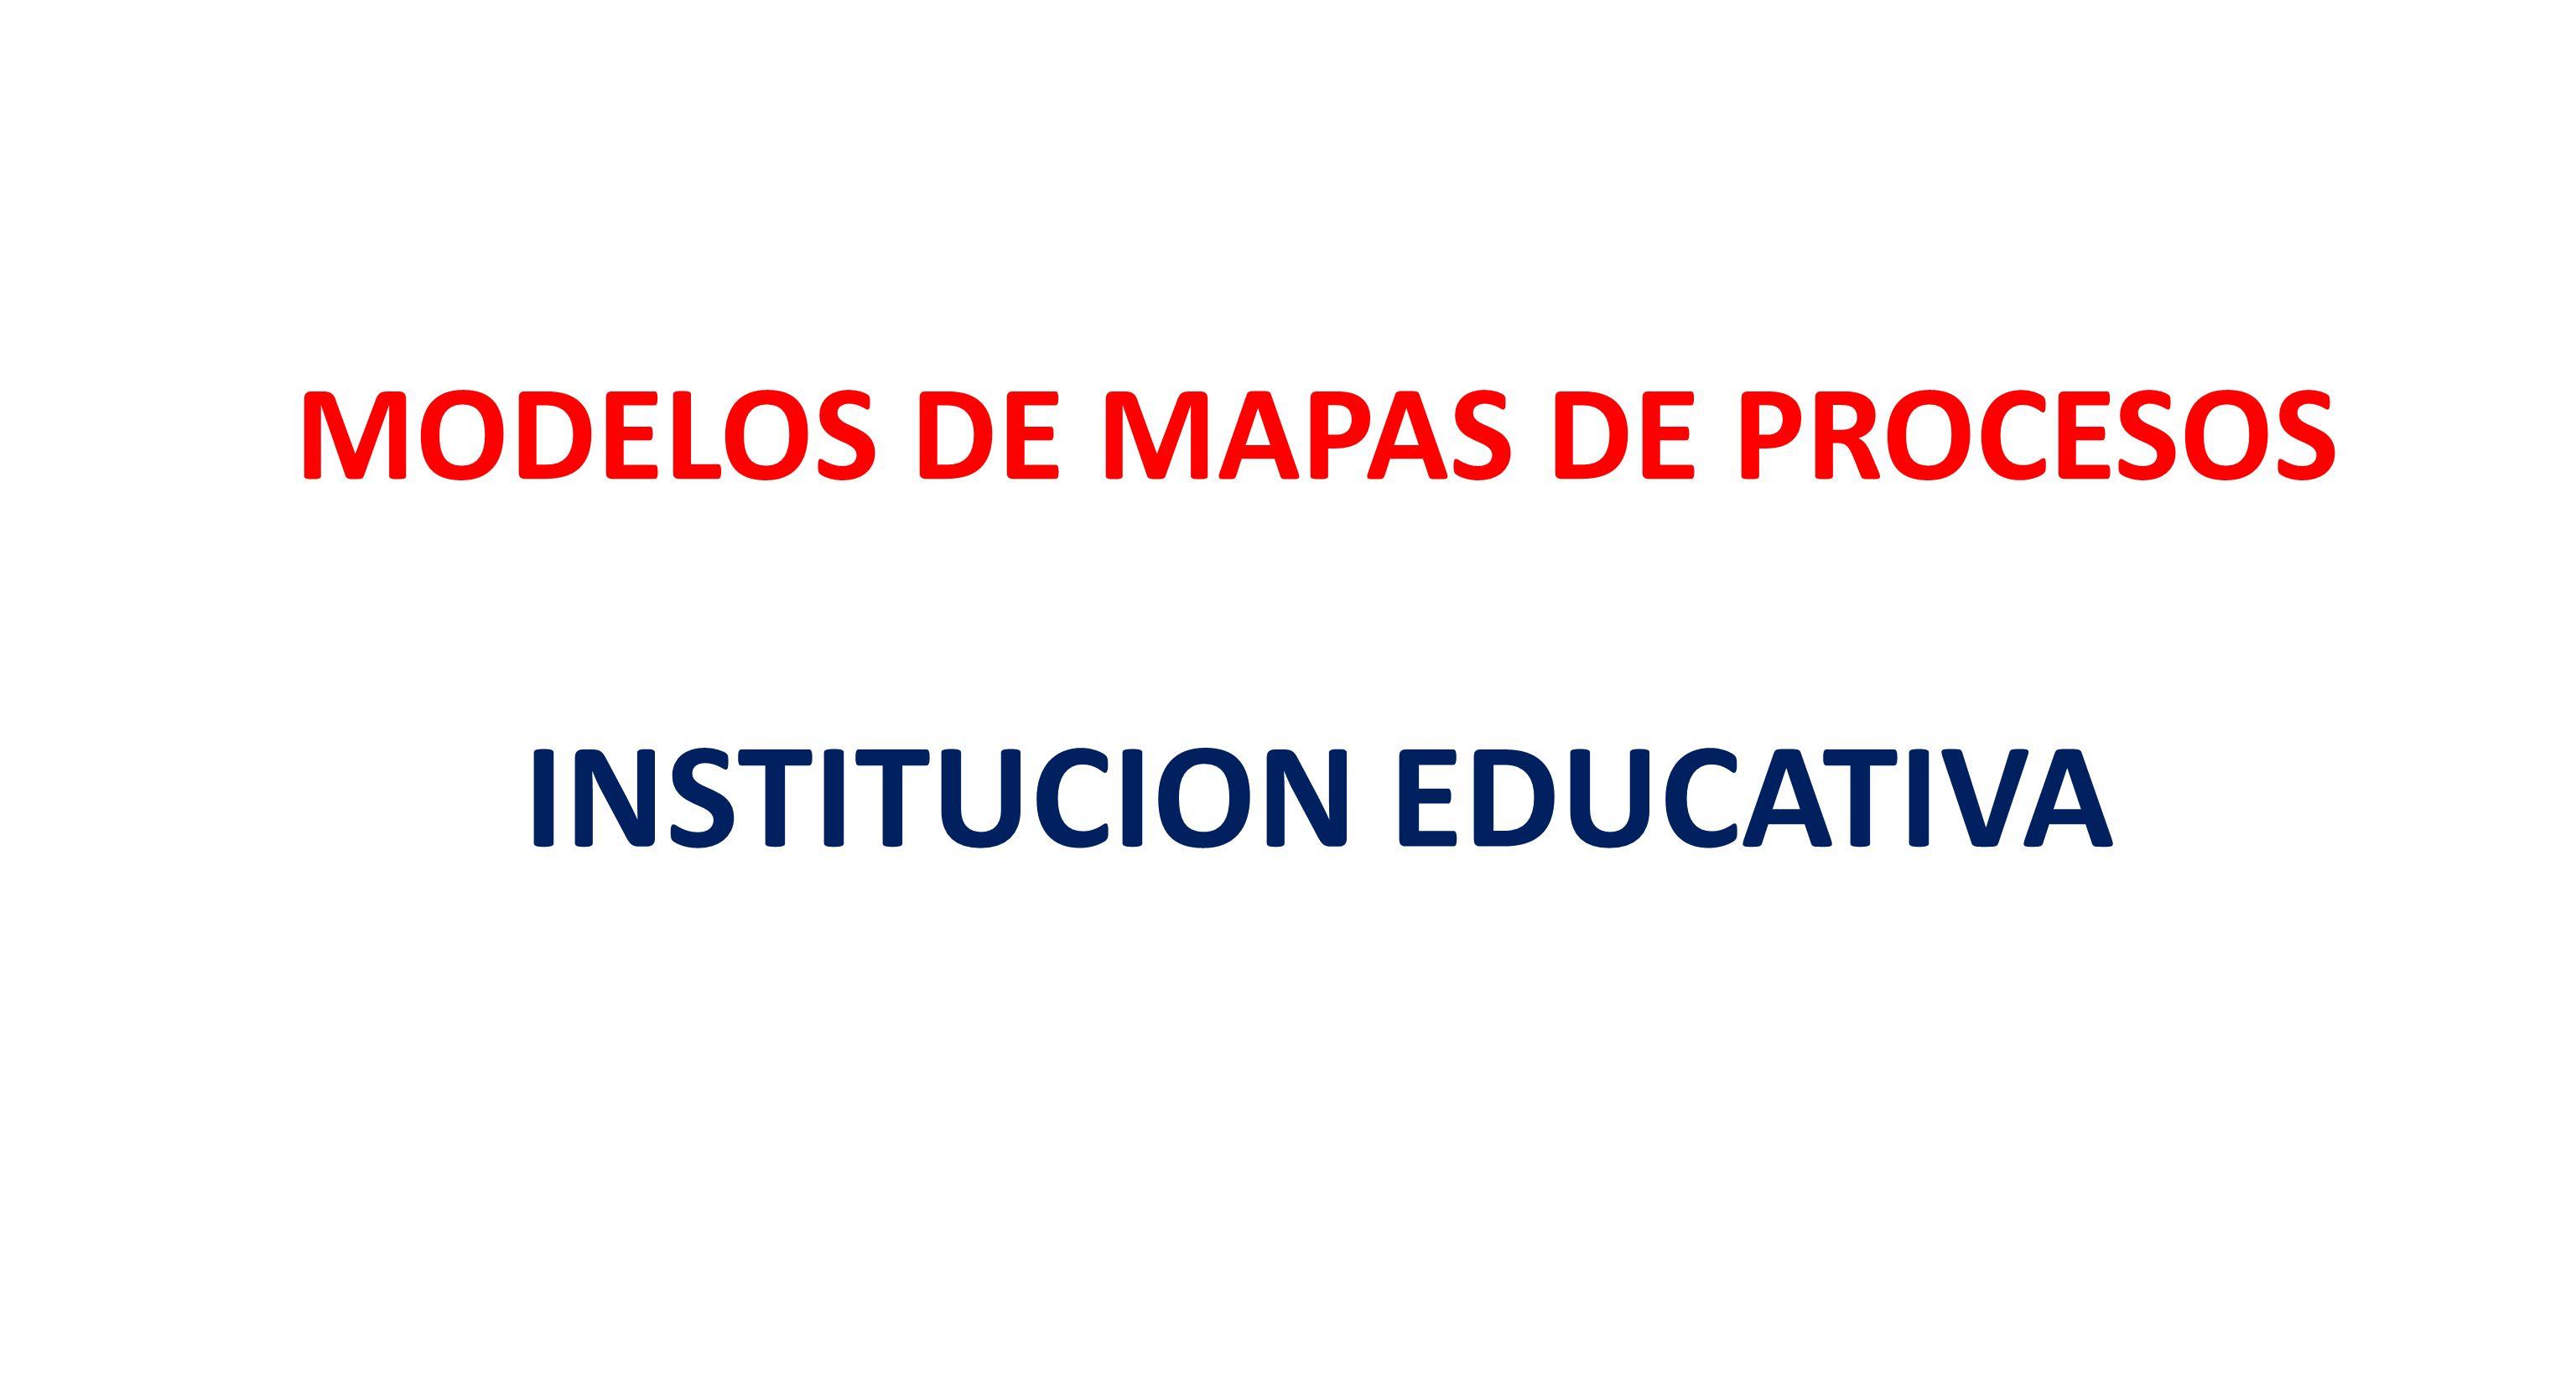 MODELOS DE MAPAS DE PROCESOS INSTITUCION EDUCATIVA